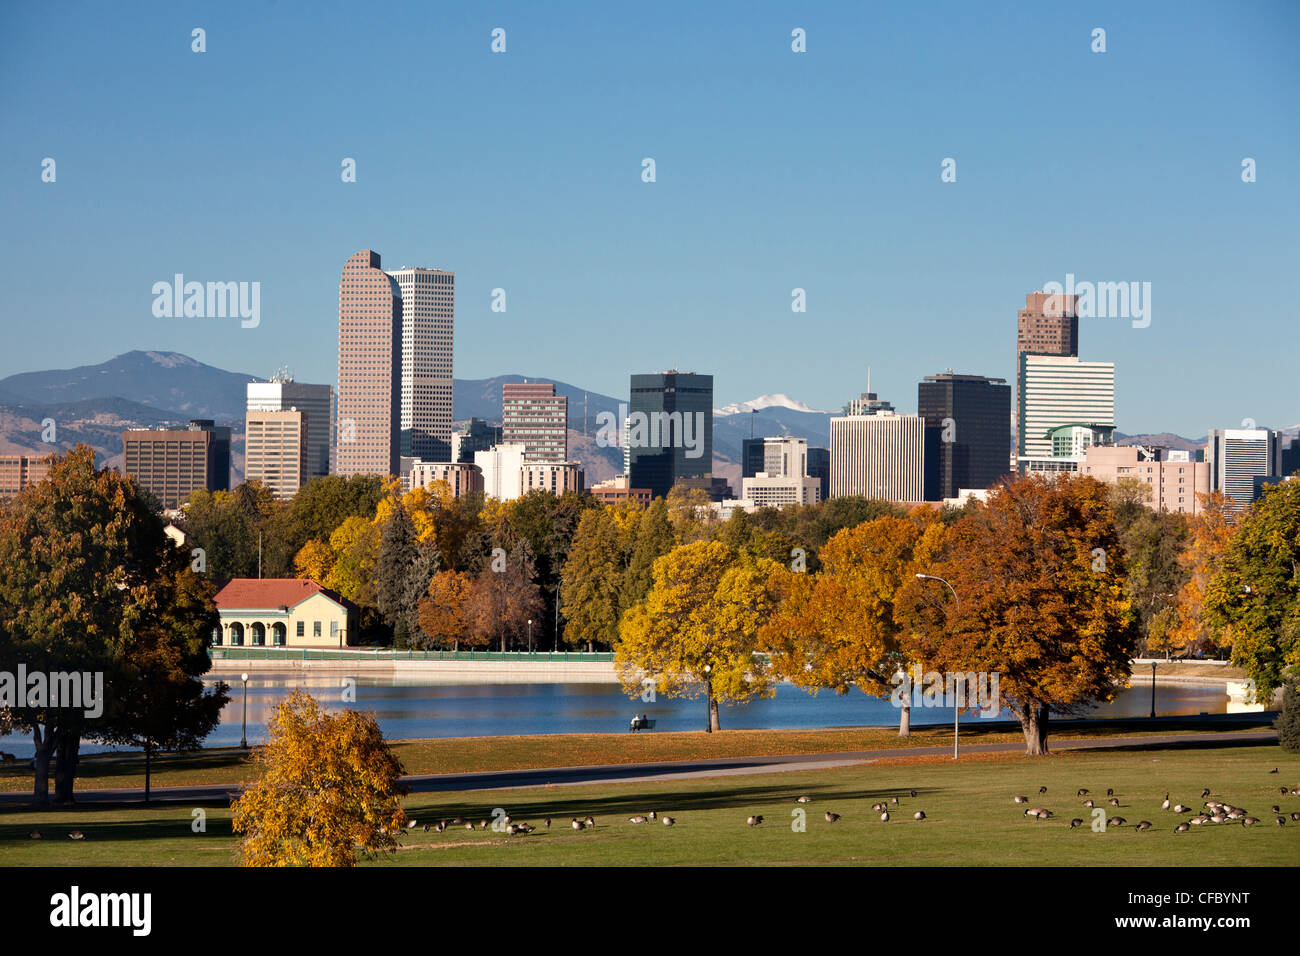 USA, United States, America, Colorado, Denver, City, Park, Downtown, Skyline, Autumn, architecture, city, pond, - Stock Image